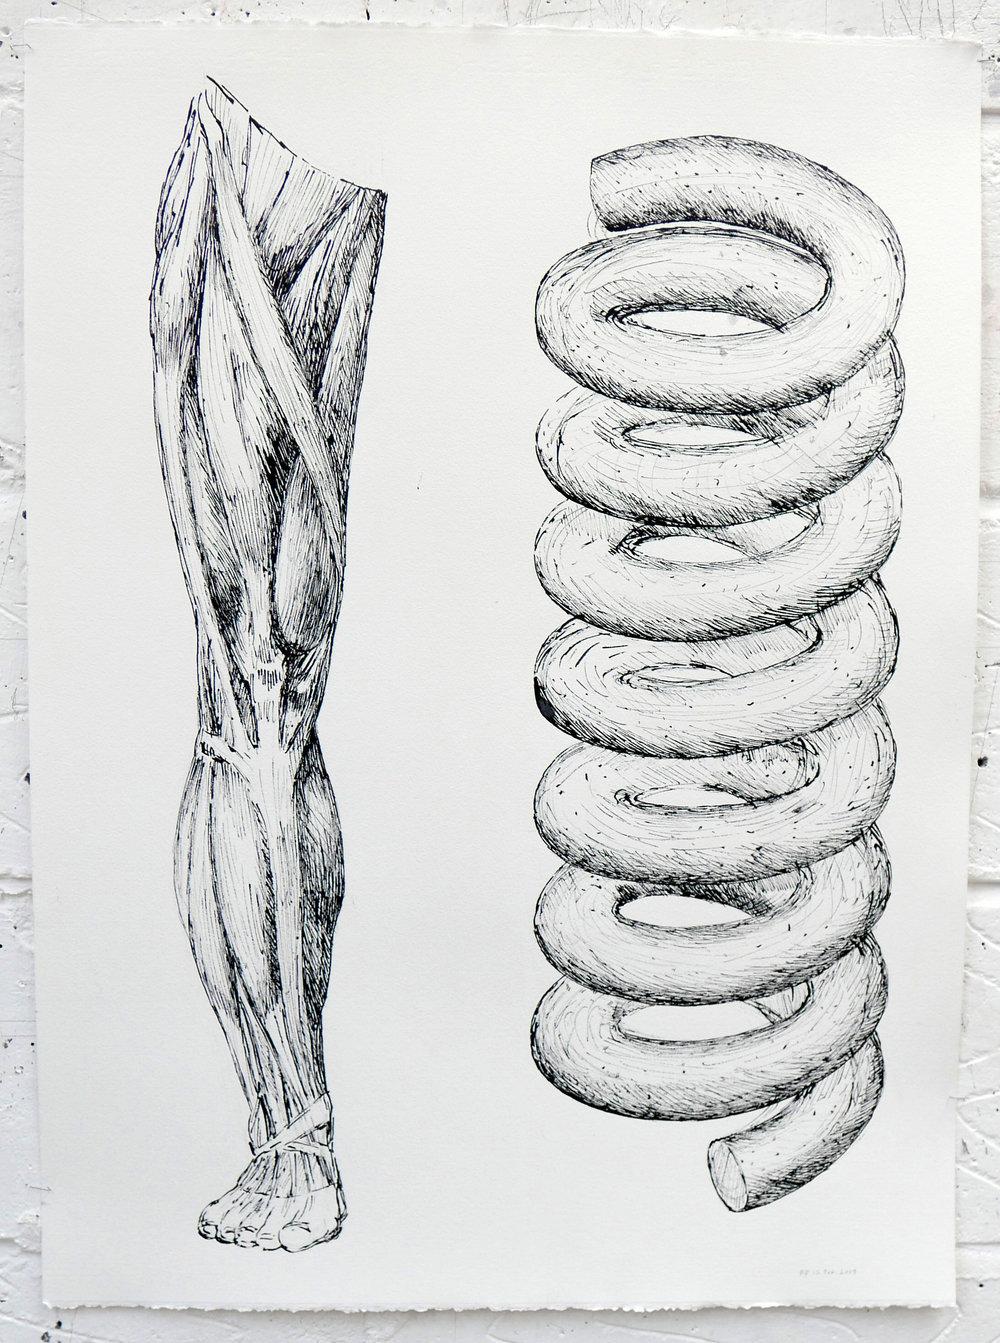 Drawings 2019 Painting 2019 Polythene drawing Plait Spoon 032.JPG